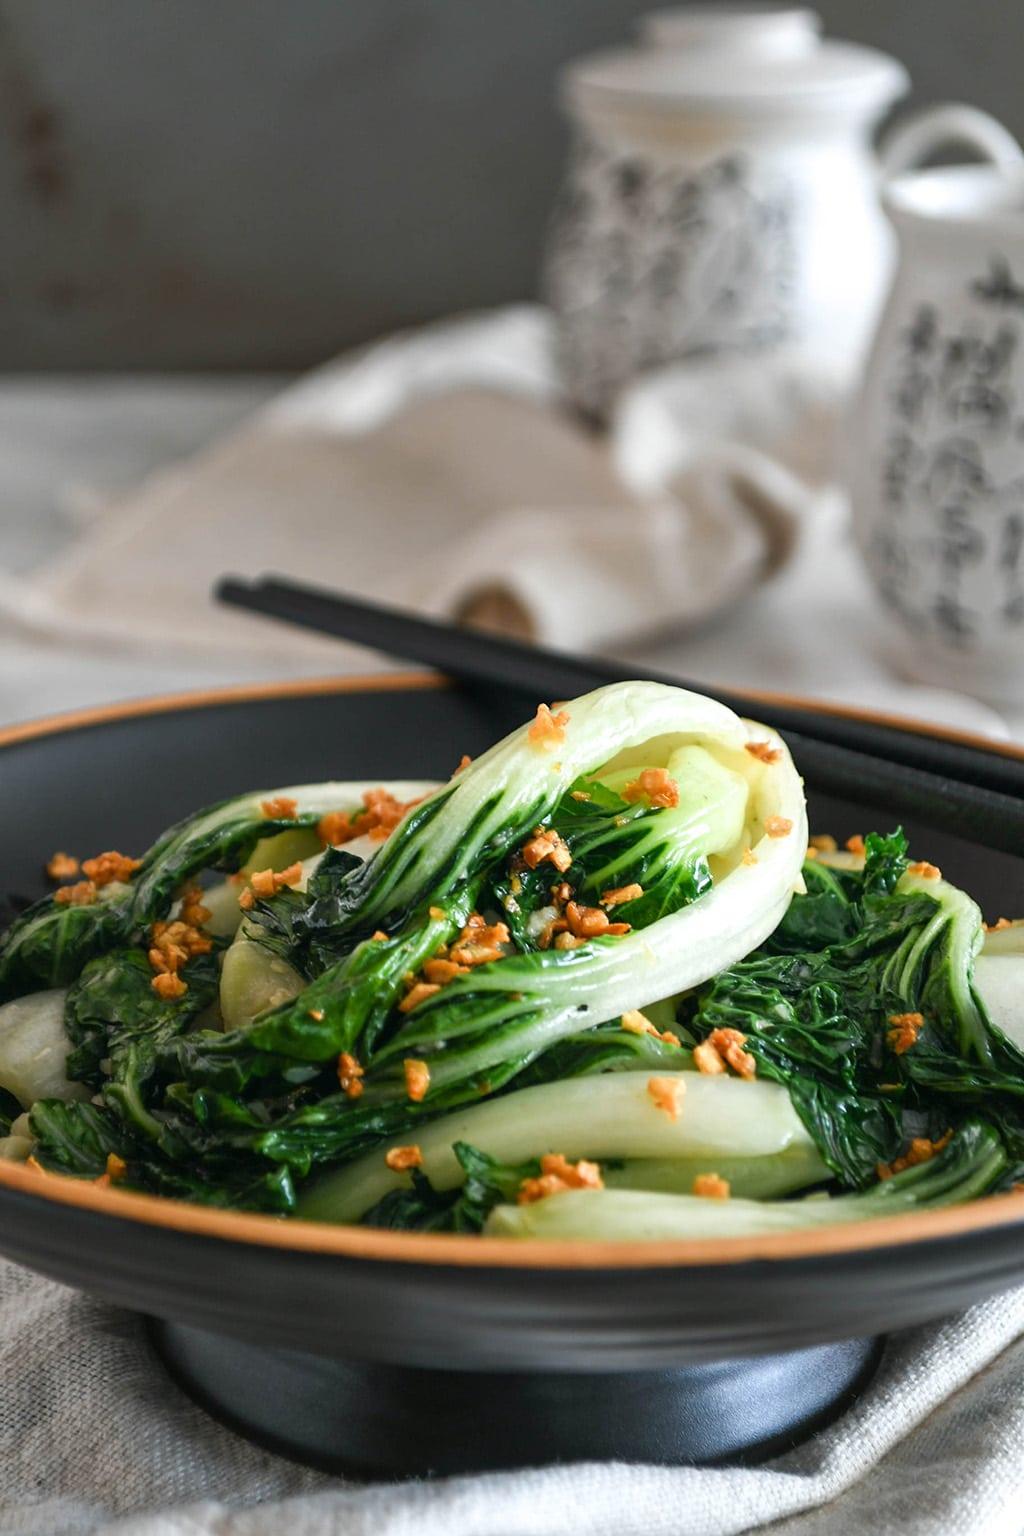 Stir-fried Nai Bai (or Bak Choy) with Garlic